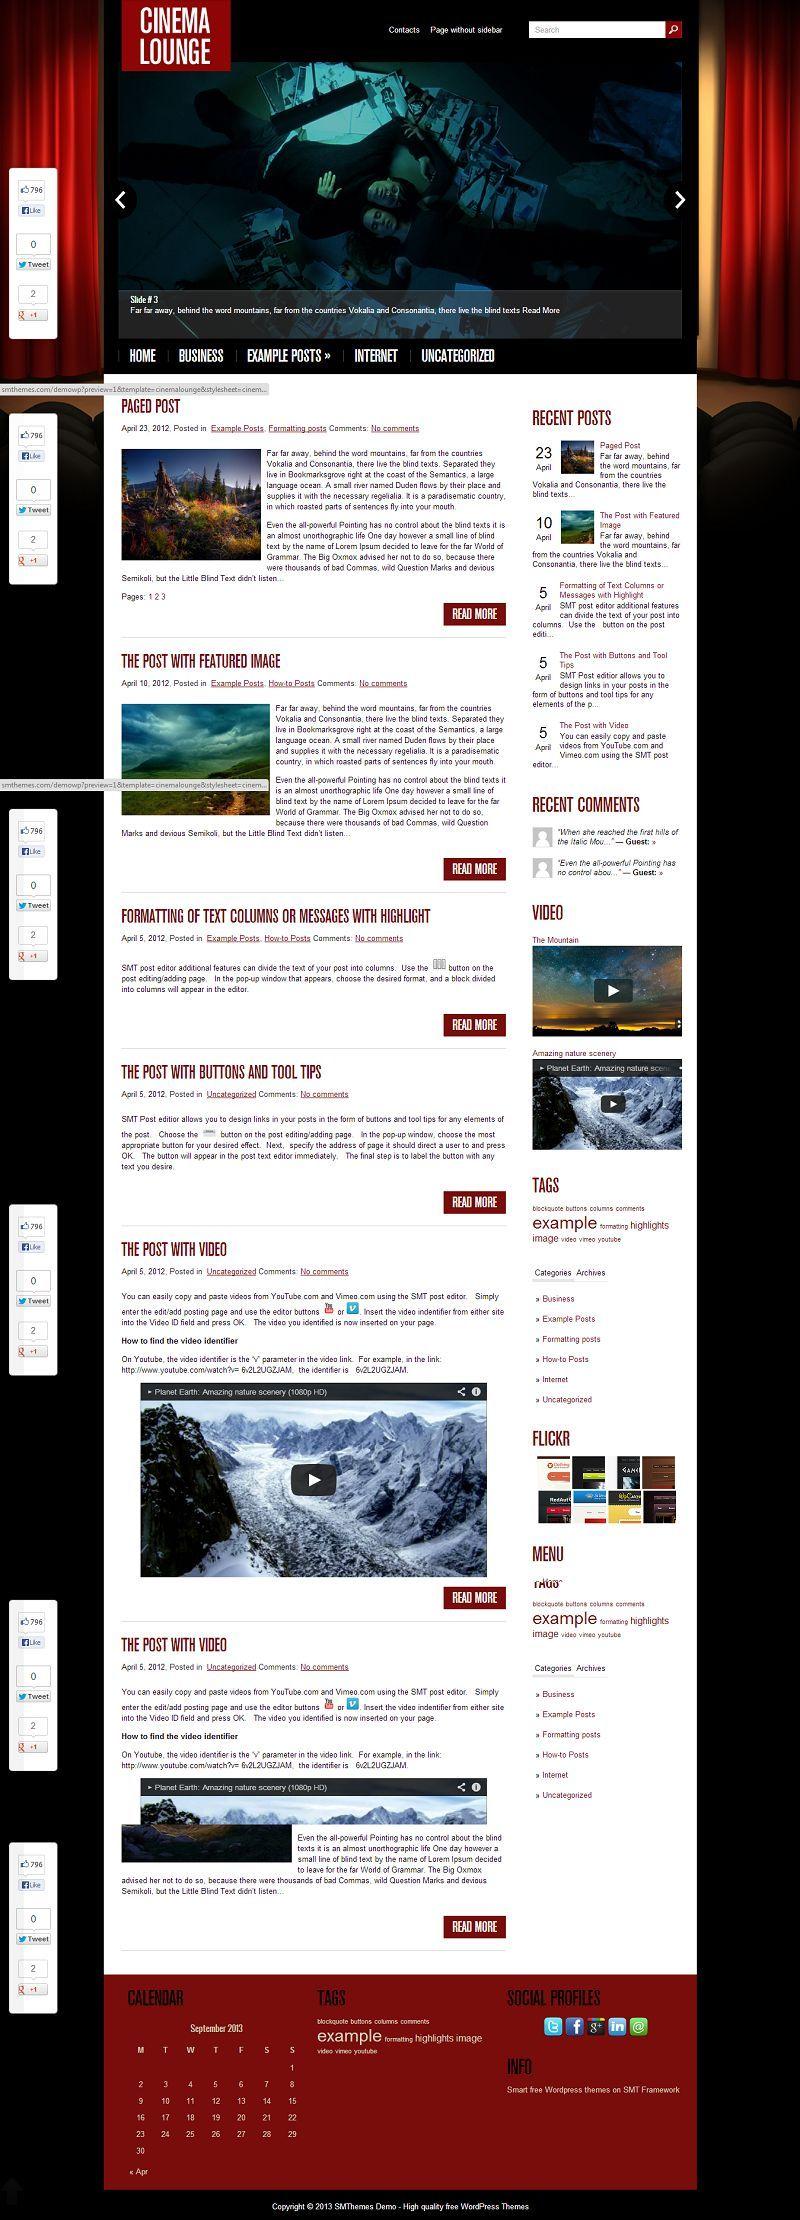 CinemaLounge - Download Free WordPress Theme by SMThemes   Free ...